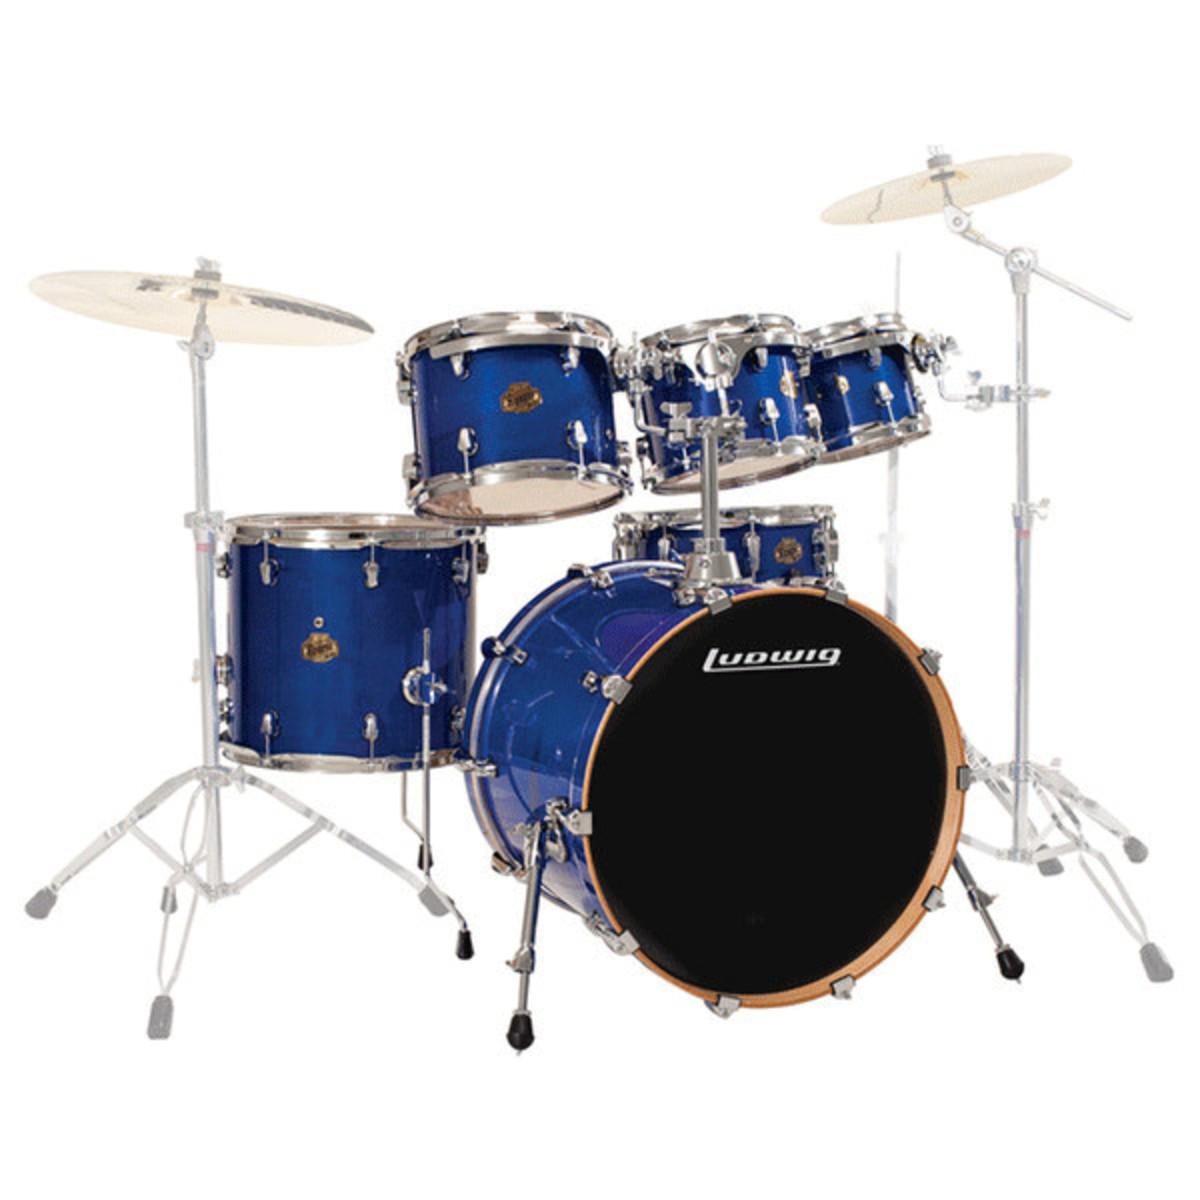 ludwig element lacquer fusion acoustic drum kit deep blue at. Black Bedroom Furniture Sets. Home Design Ideas